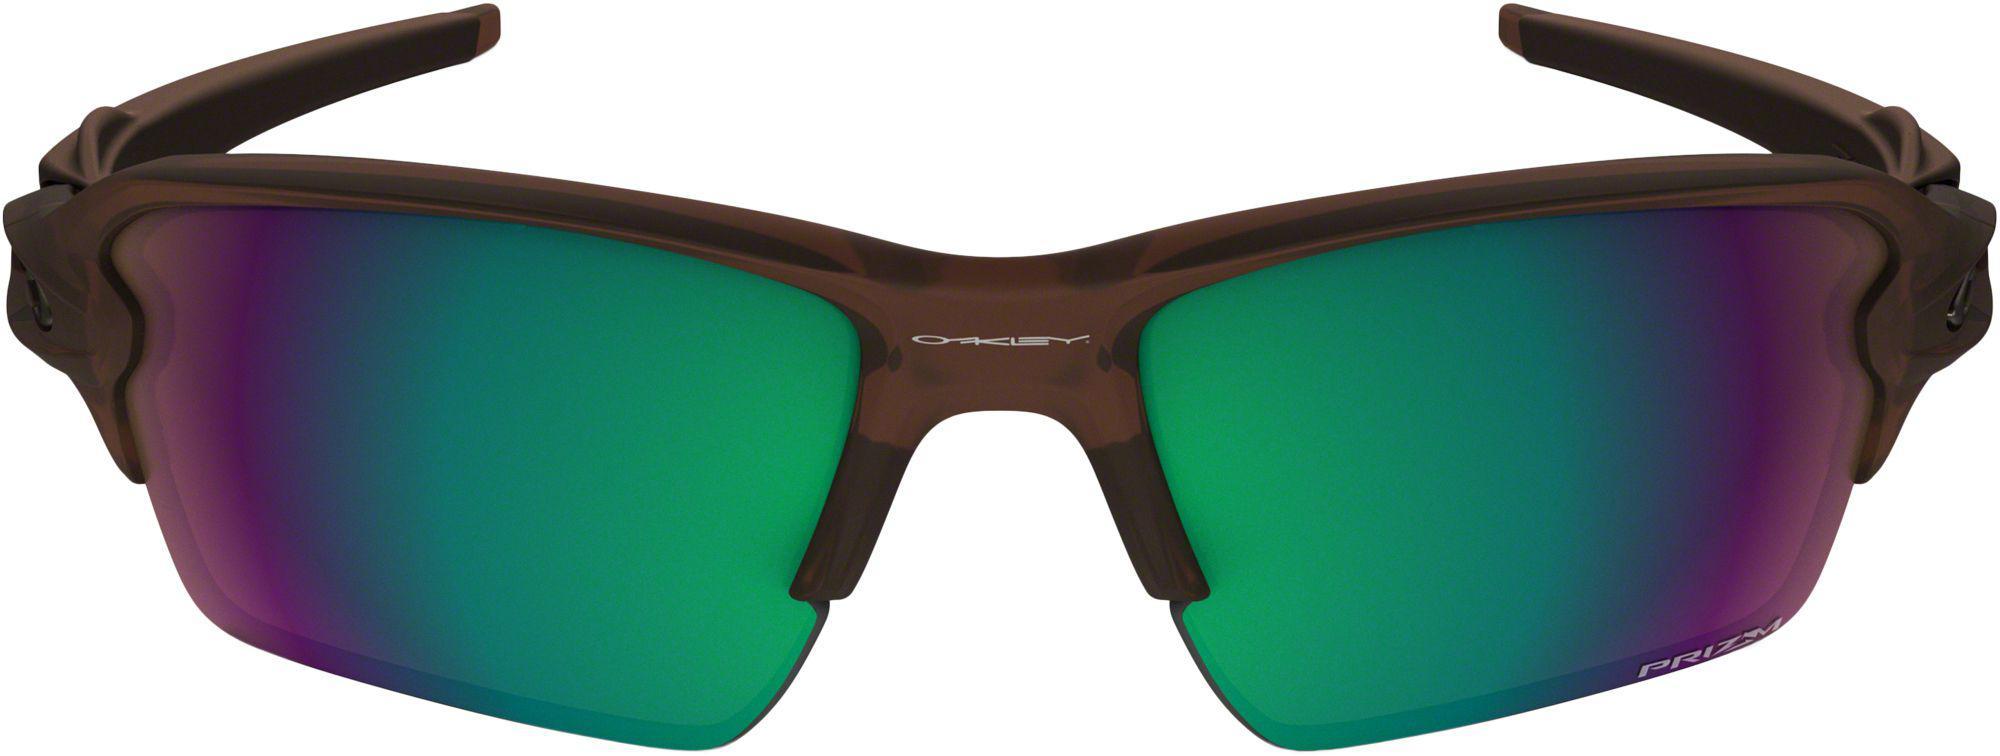 9c69fba40885 Lyst - Oakley Flak 2.0 Xl Prizm Shallow Water Polarized Sunglasses ...